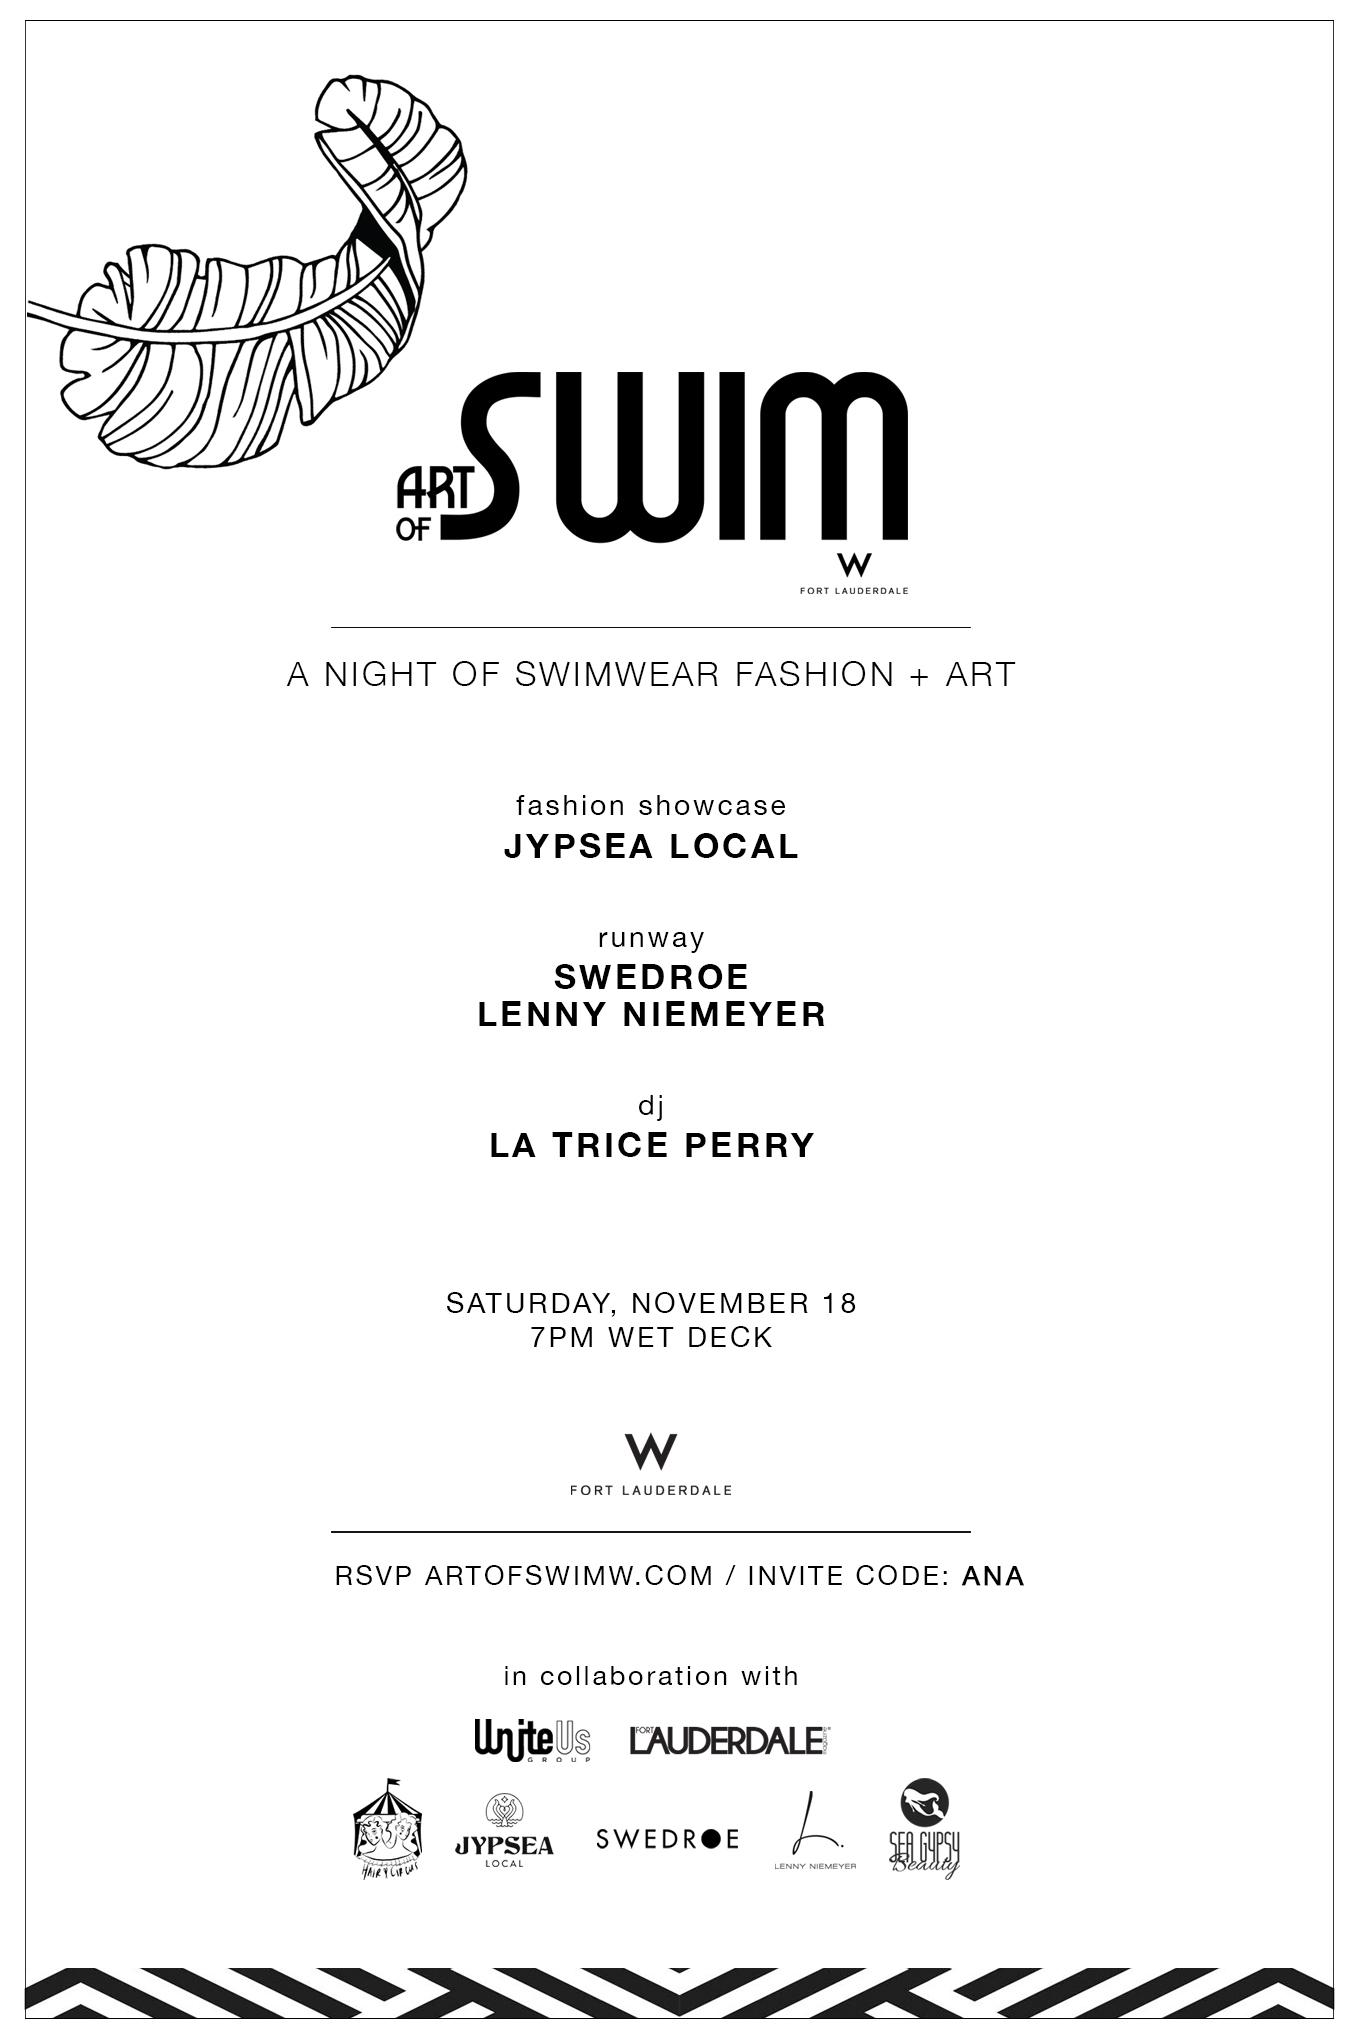 Art Of Swim W Hotel Fort Lauderdale ana florentina